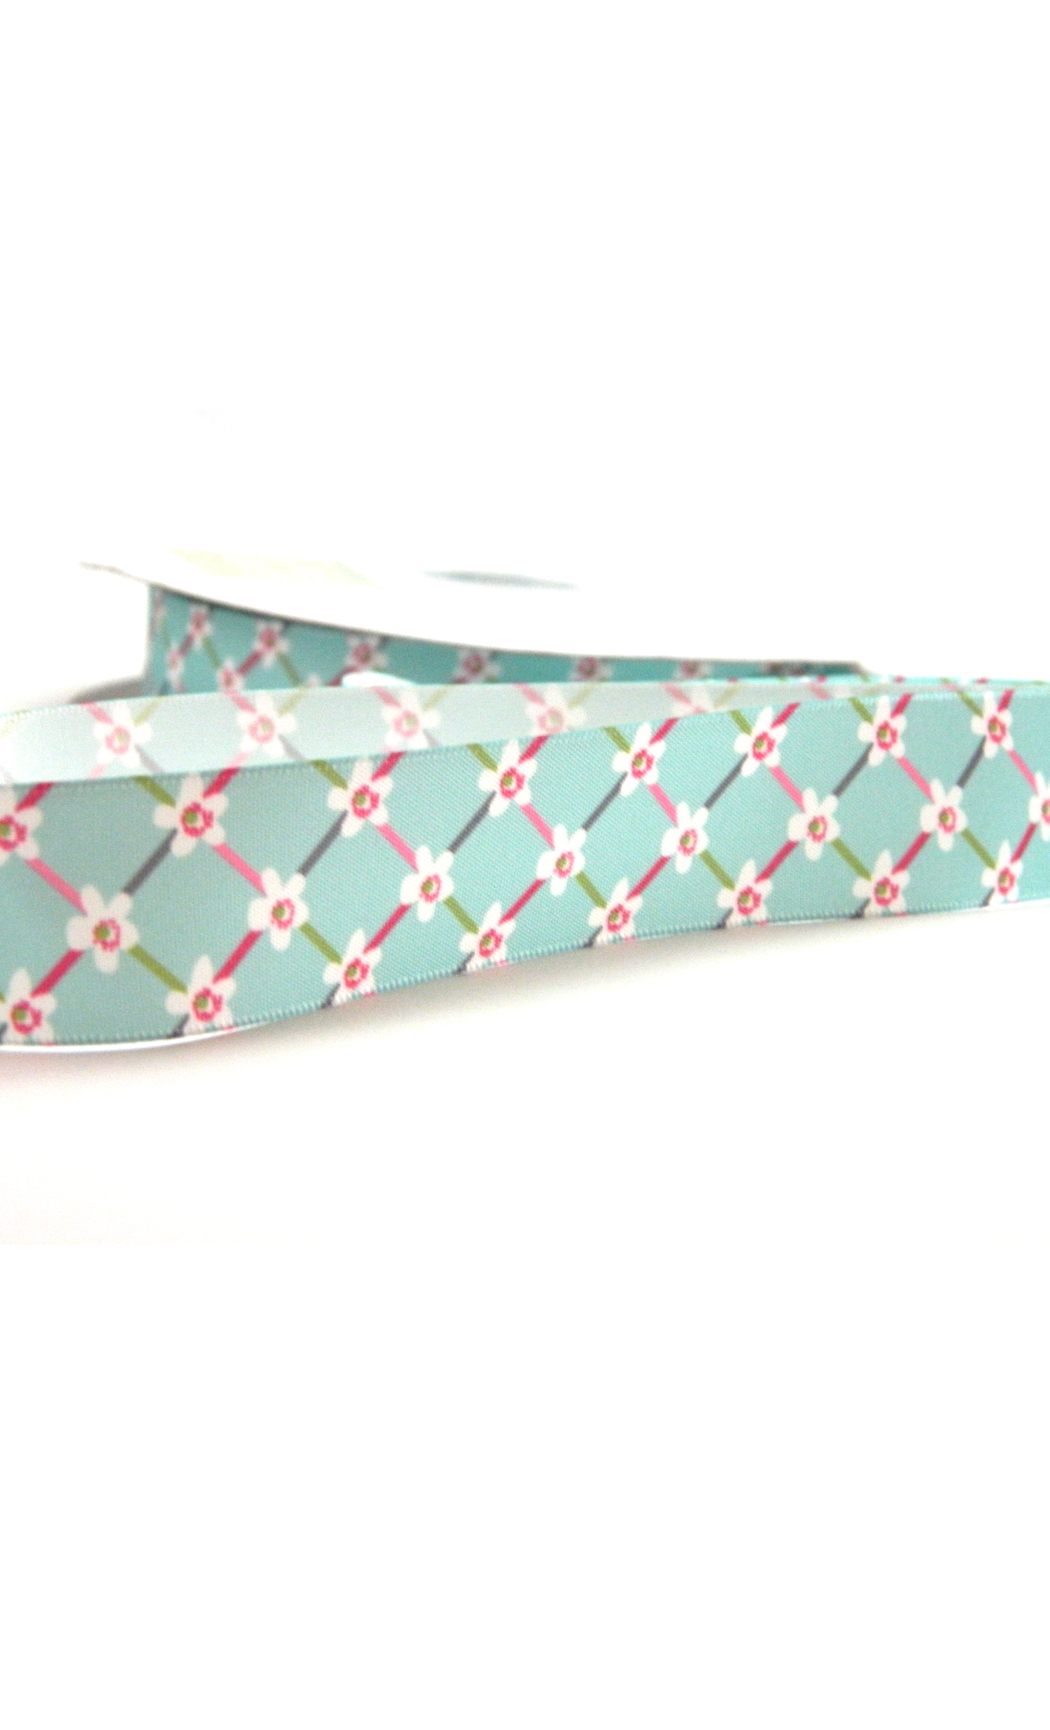 Green Satin Floral Printed Ribbon- Buy Online